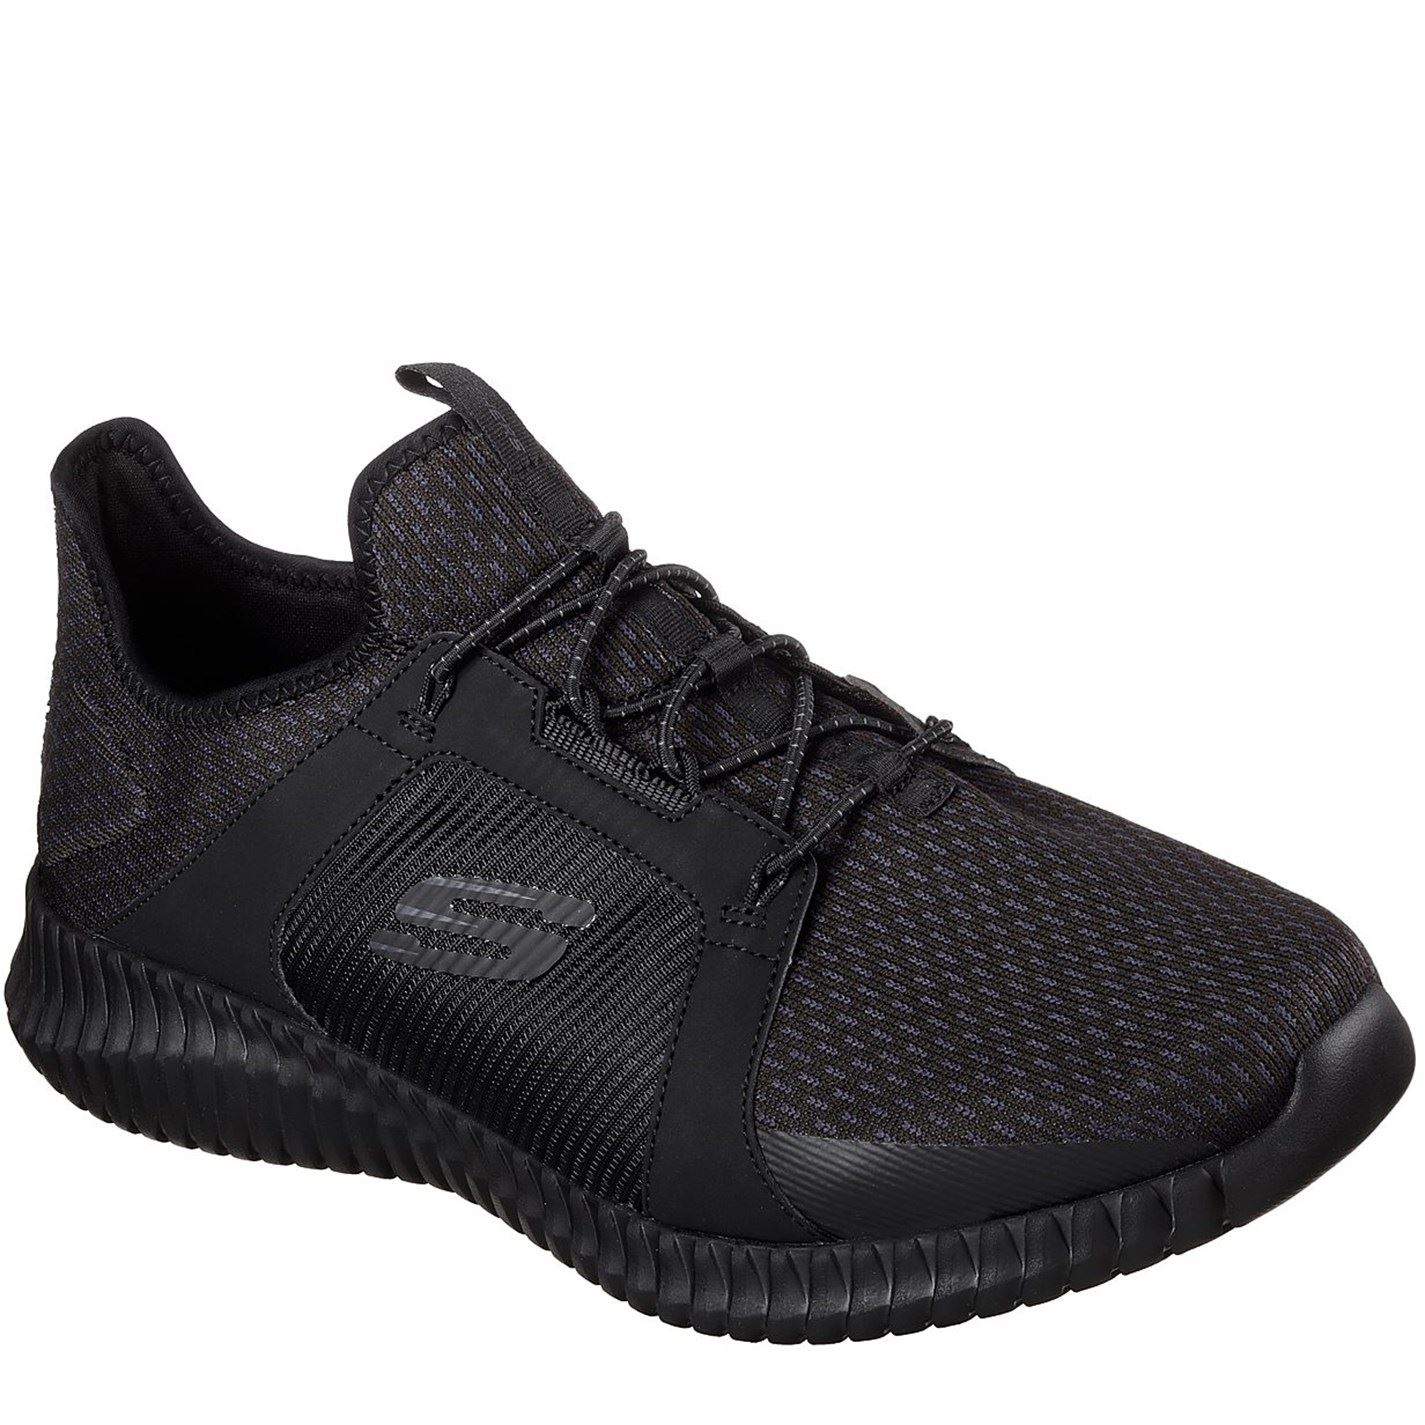 Adidasi sport Skechers Flex Elite pentru Barbati negru